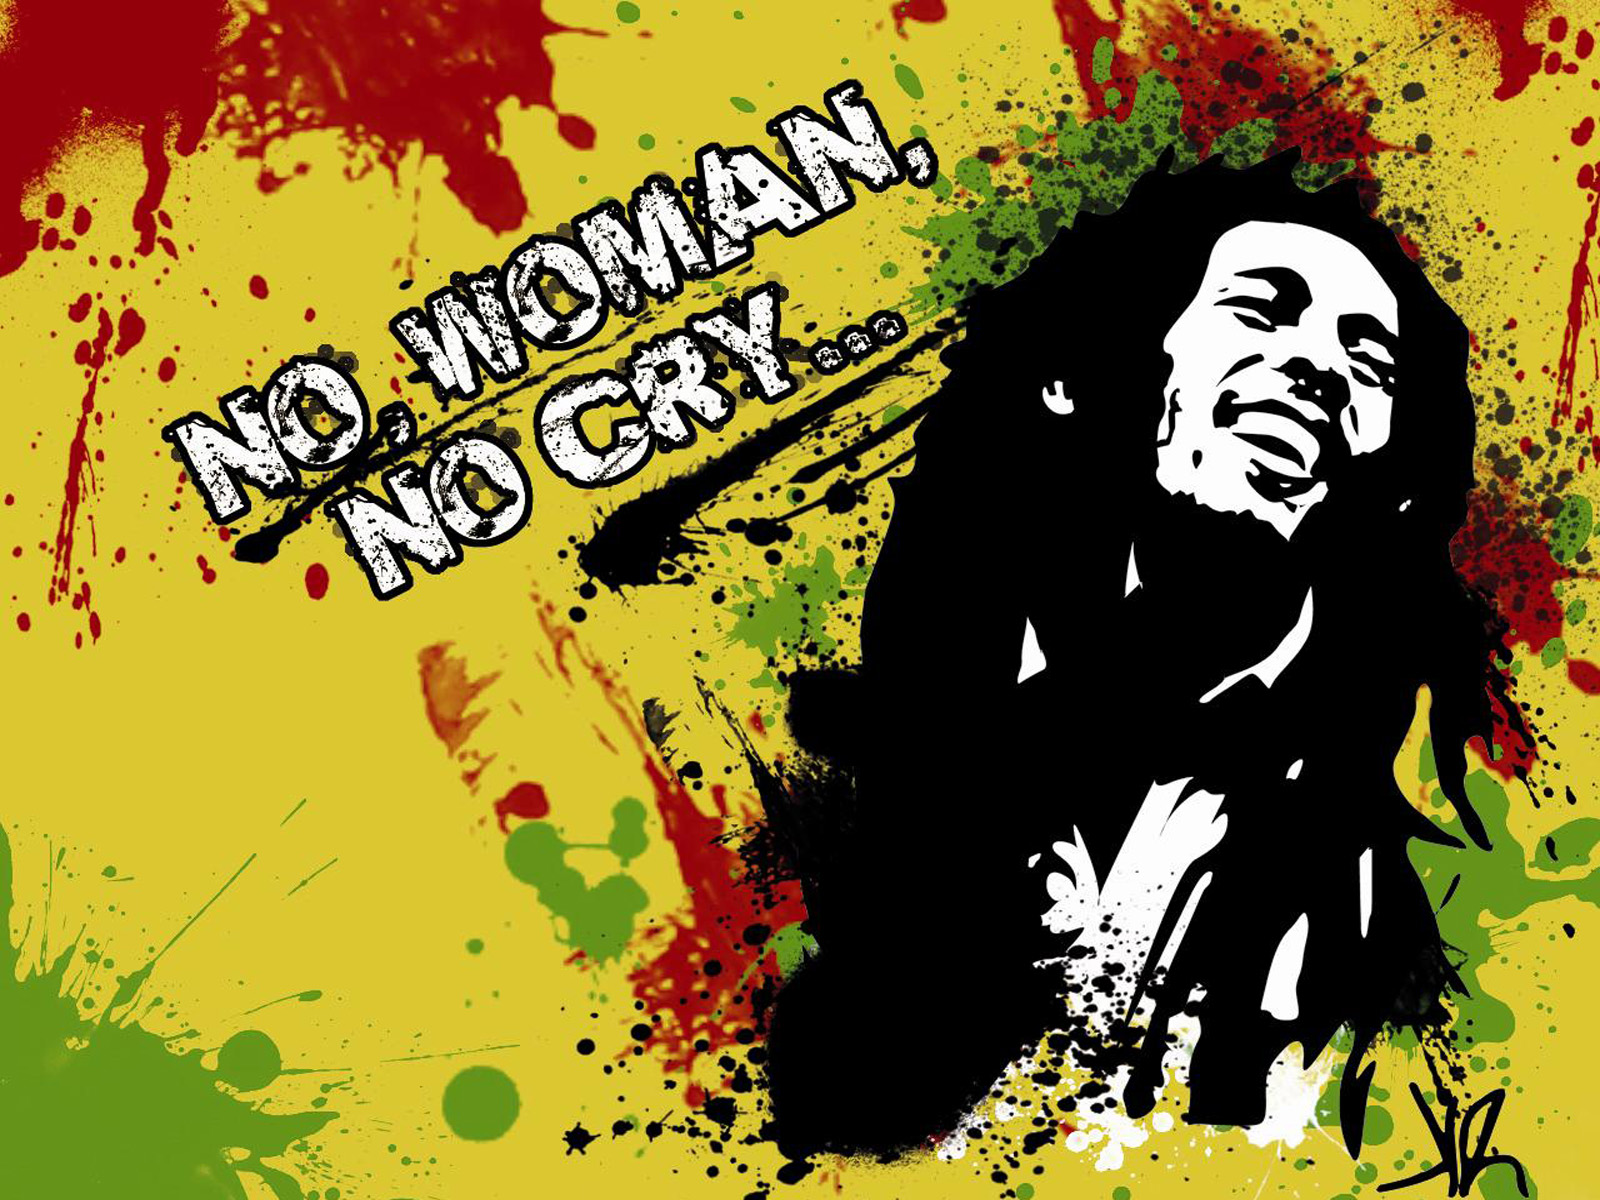 Awesome bob marley photos hd wallpapers desktop wallpapers - Reggae girl wallpaper ...